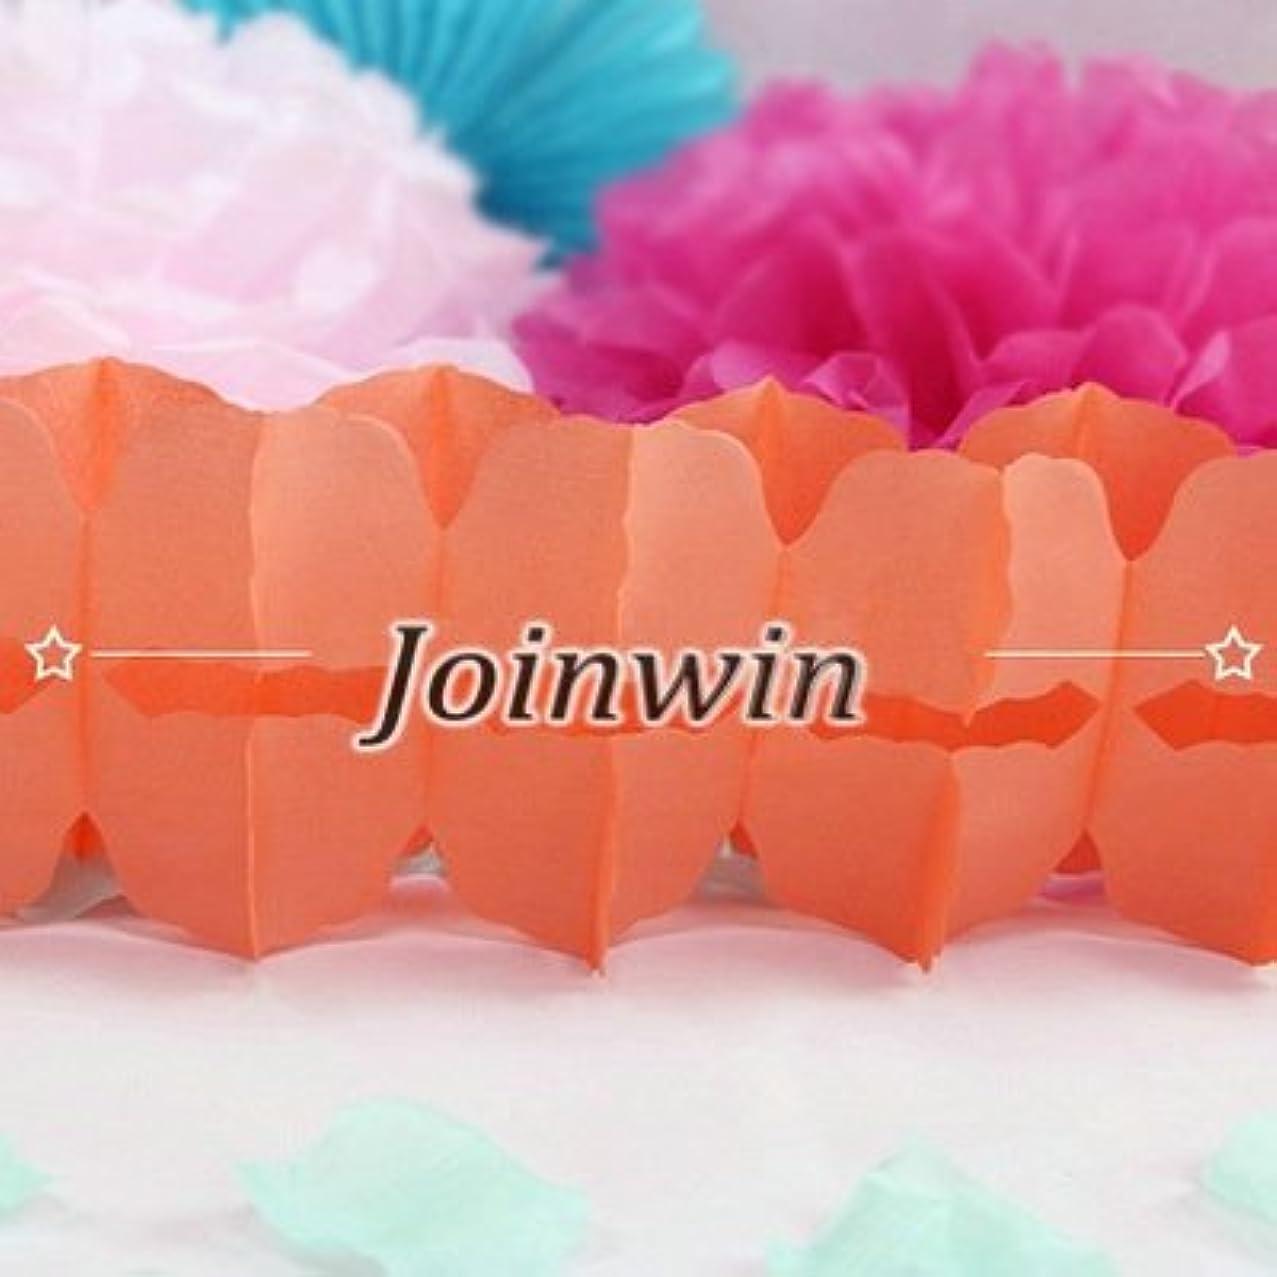 Joinwin 6Pcs Hanging Garland Four-Leaf Clover Garland Tissue Paper Flowers Garland Wedding Decor Party Decor 11.81Feet/3.6M (Peach)